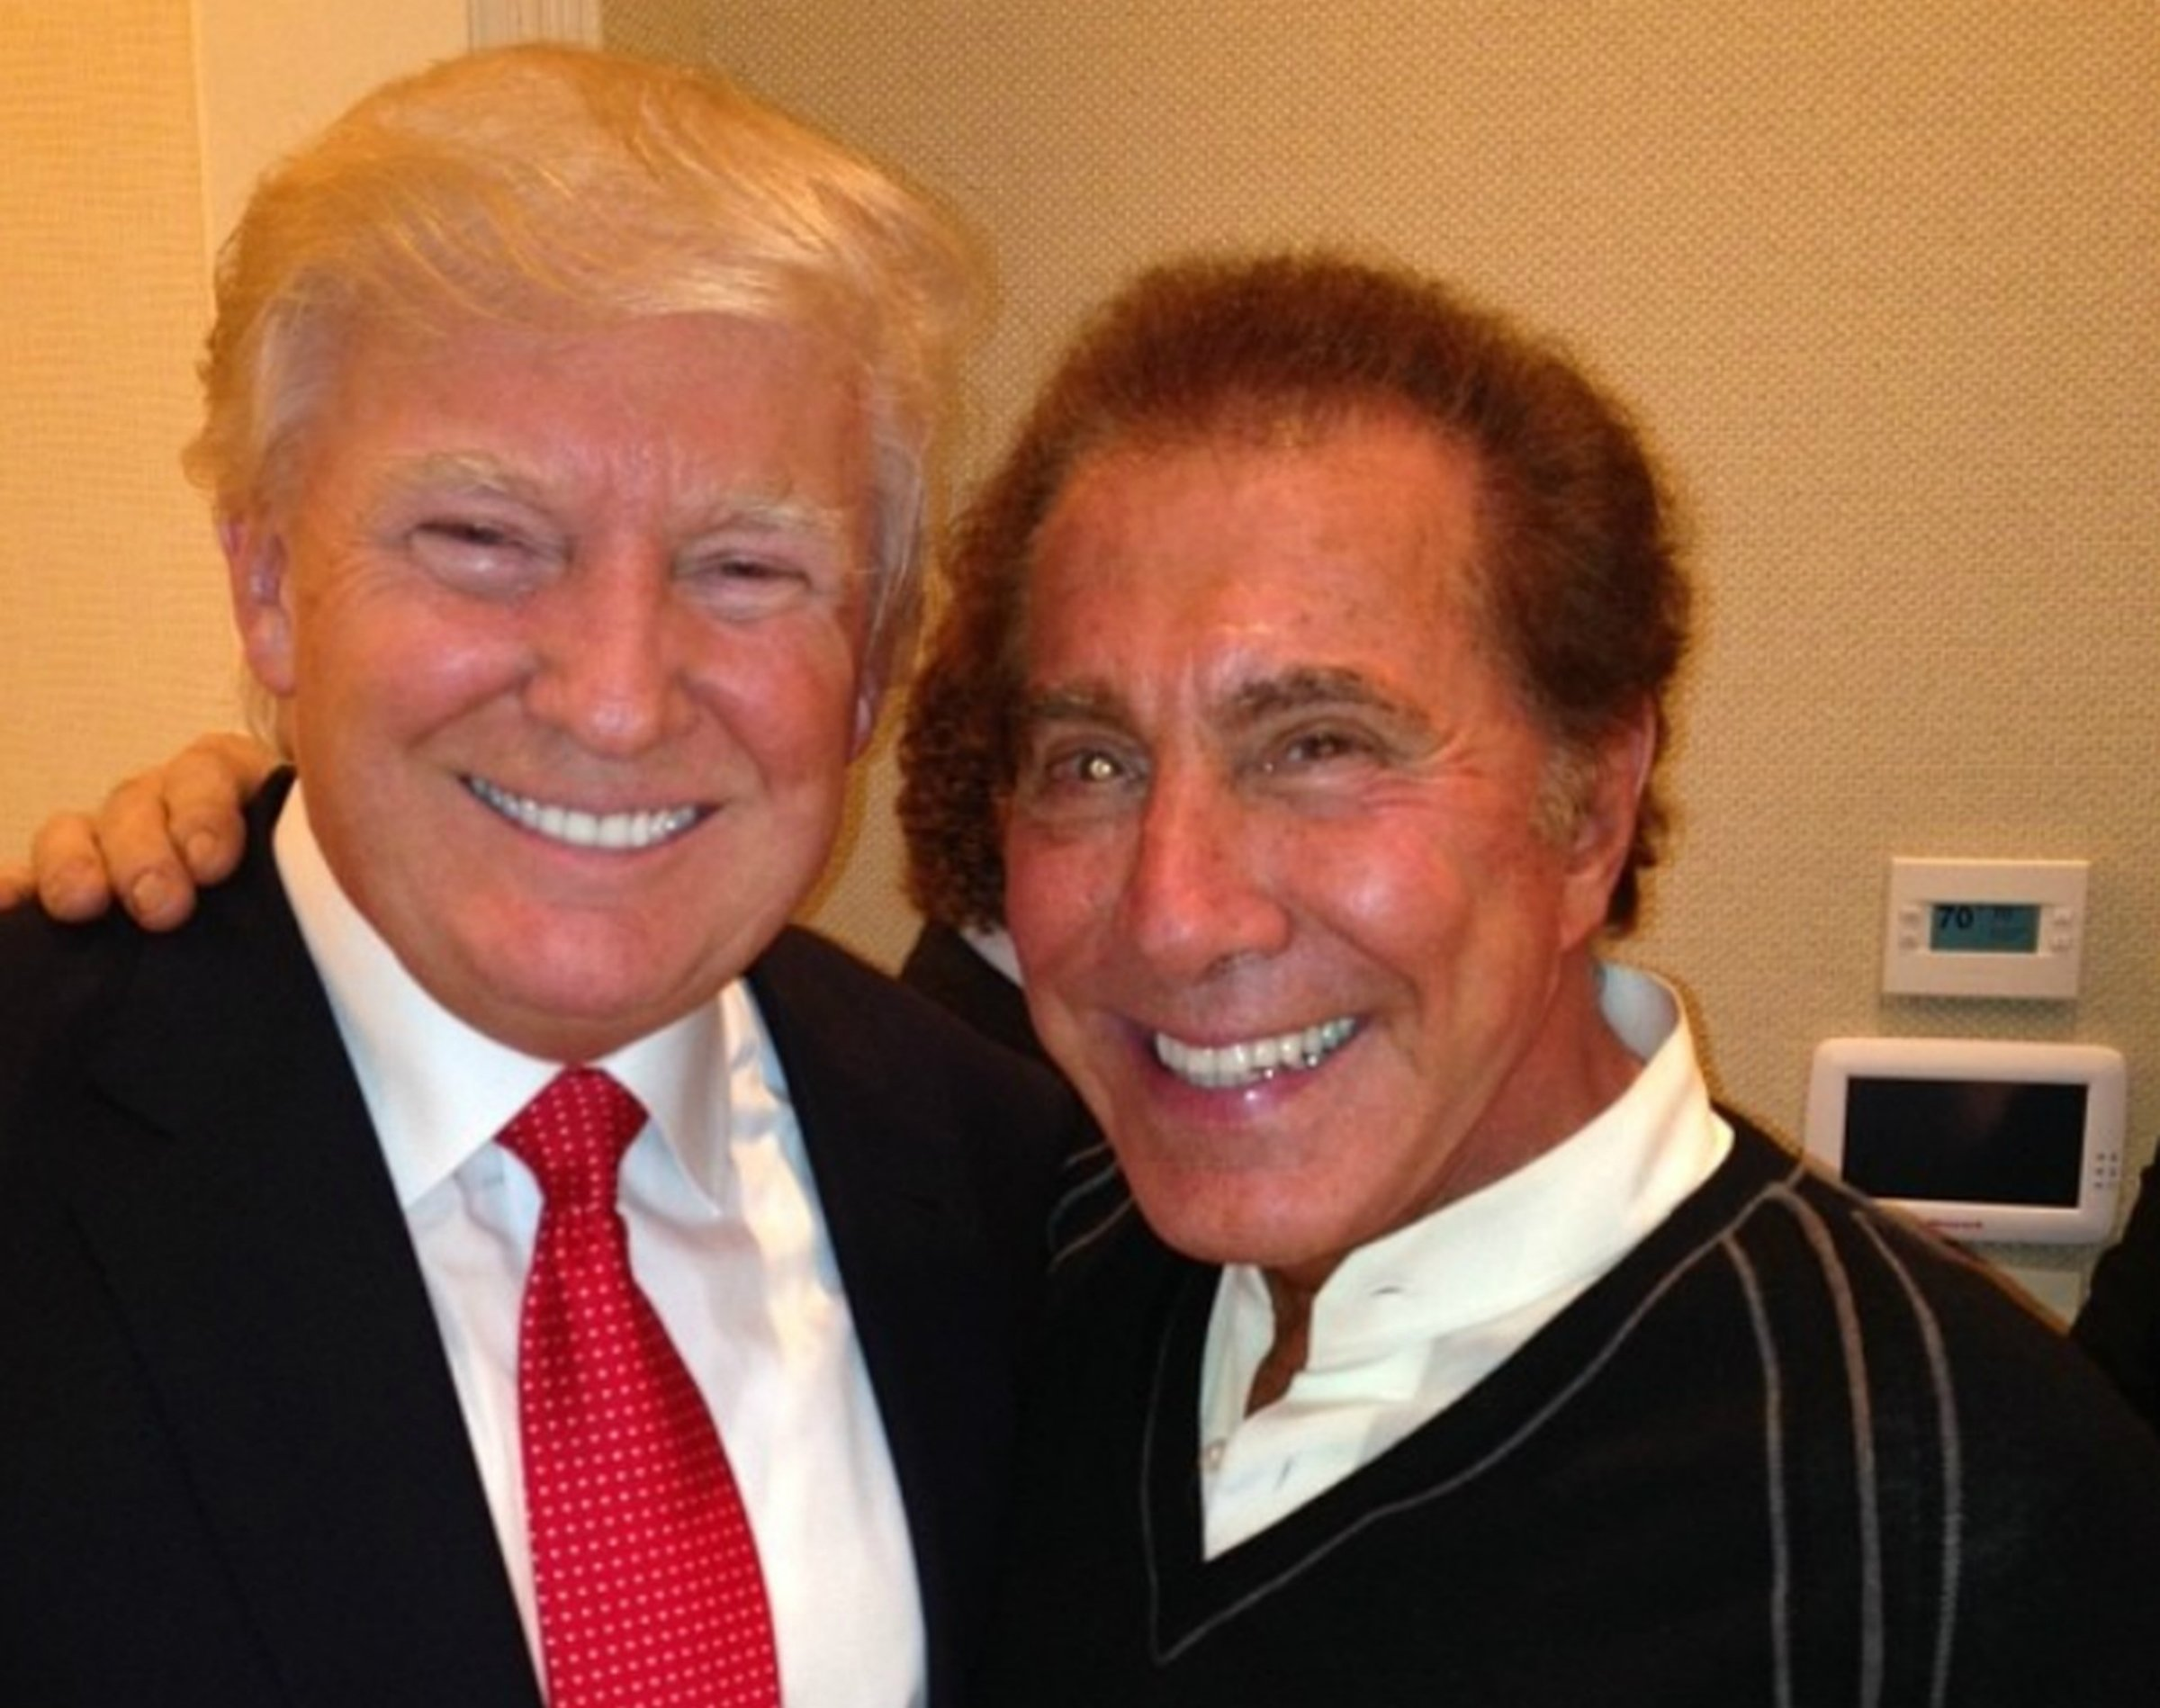 Steve Wynn Donald Trump RNC